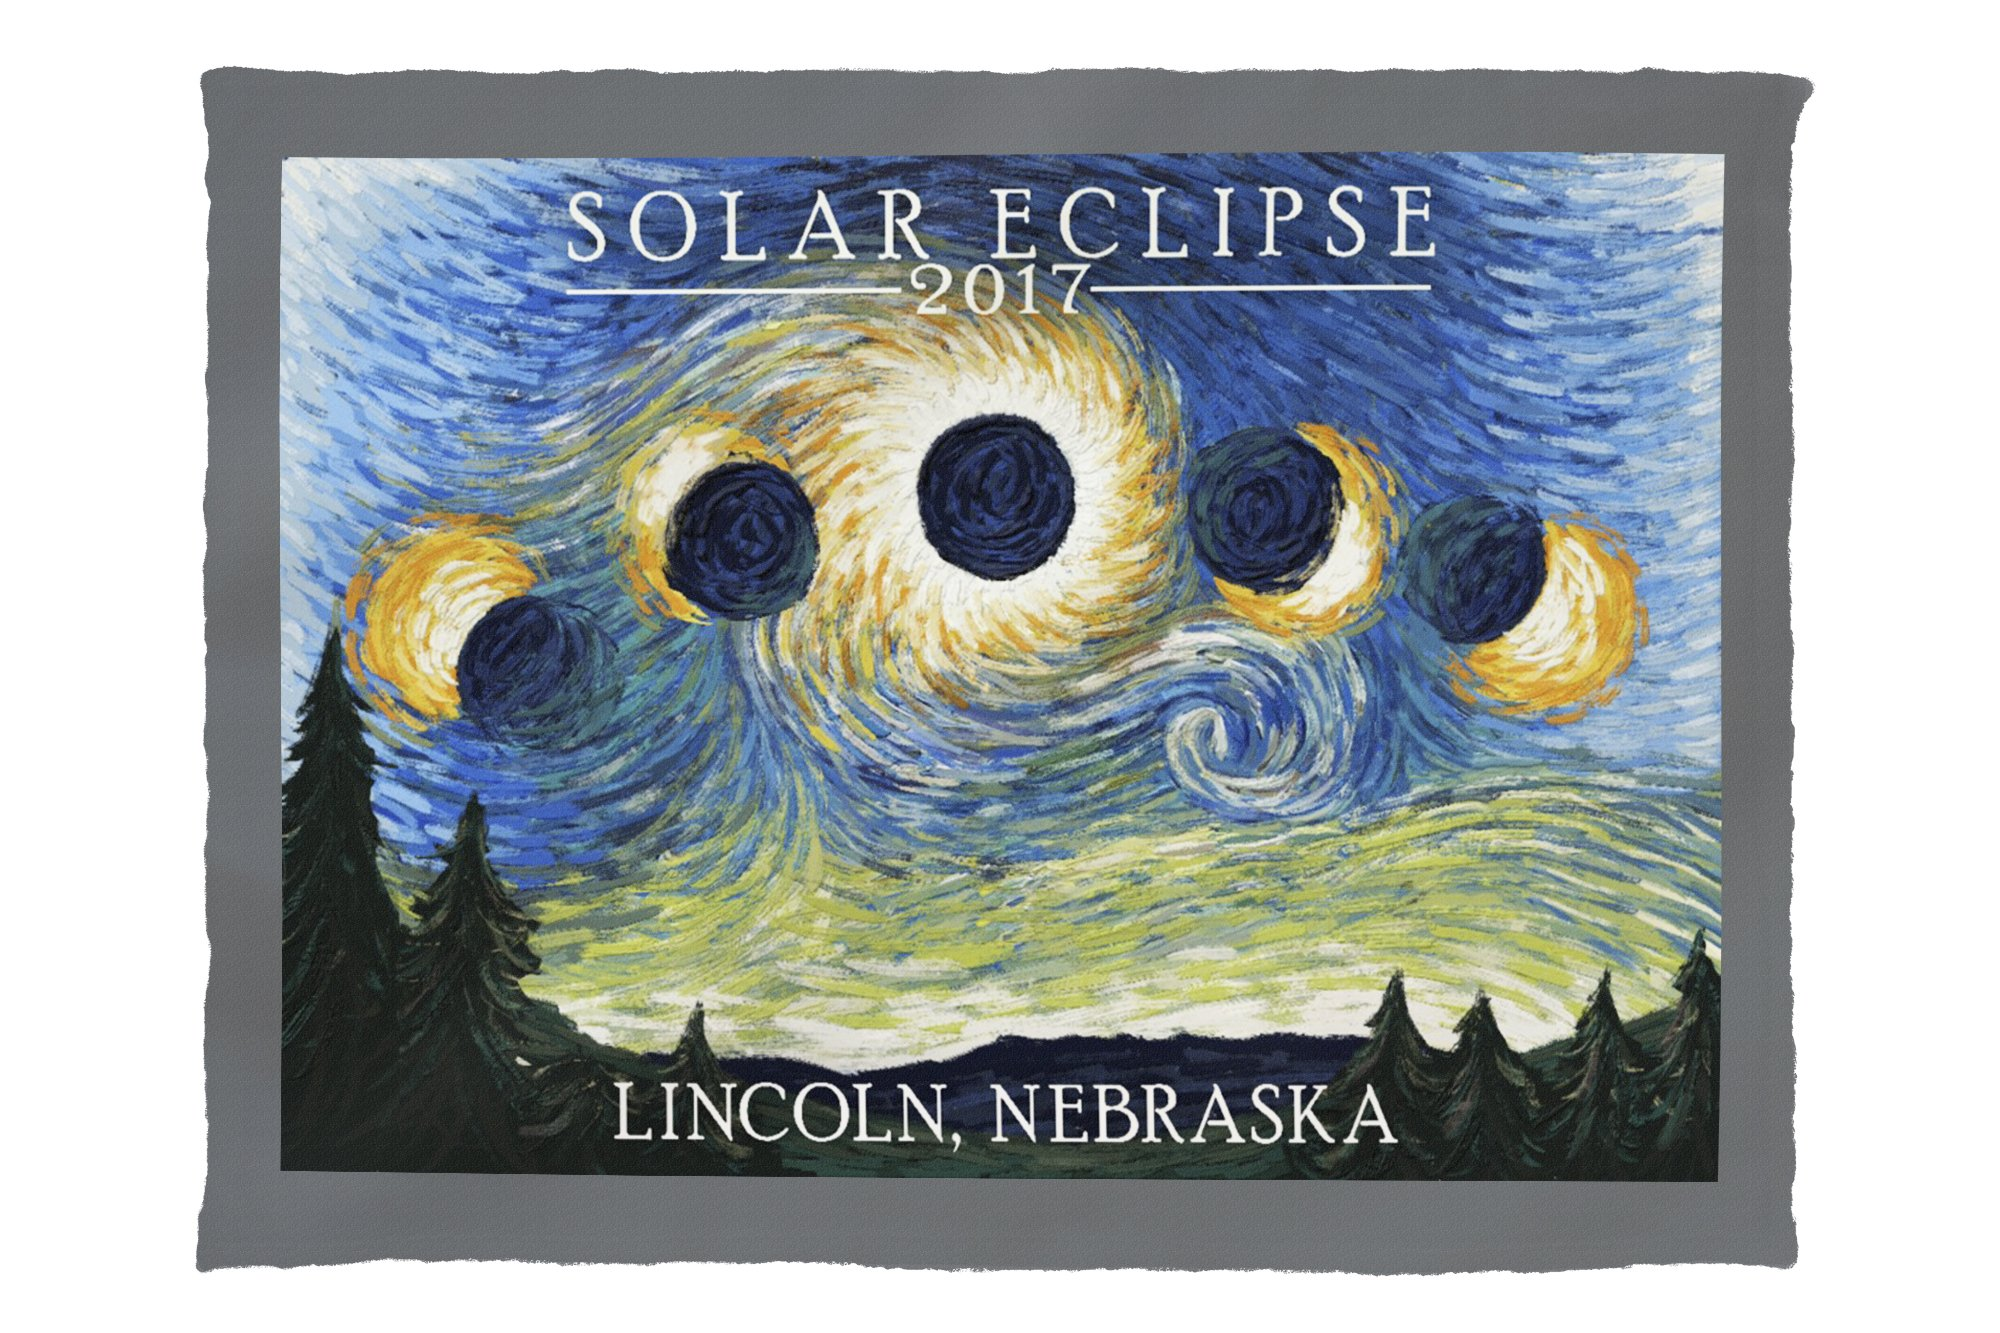 Lincoln, Nebraska - Solar Eclipse 2017 - Starry Night (60x80 Poly Fleece Thick Plush Blanket)